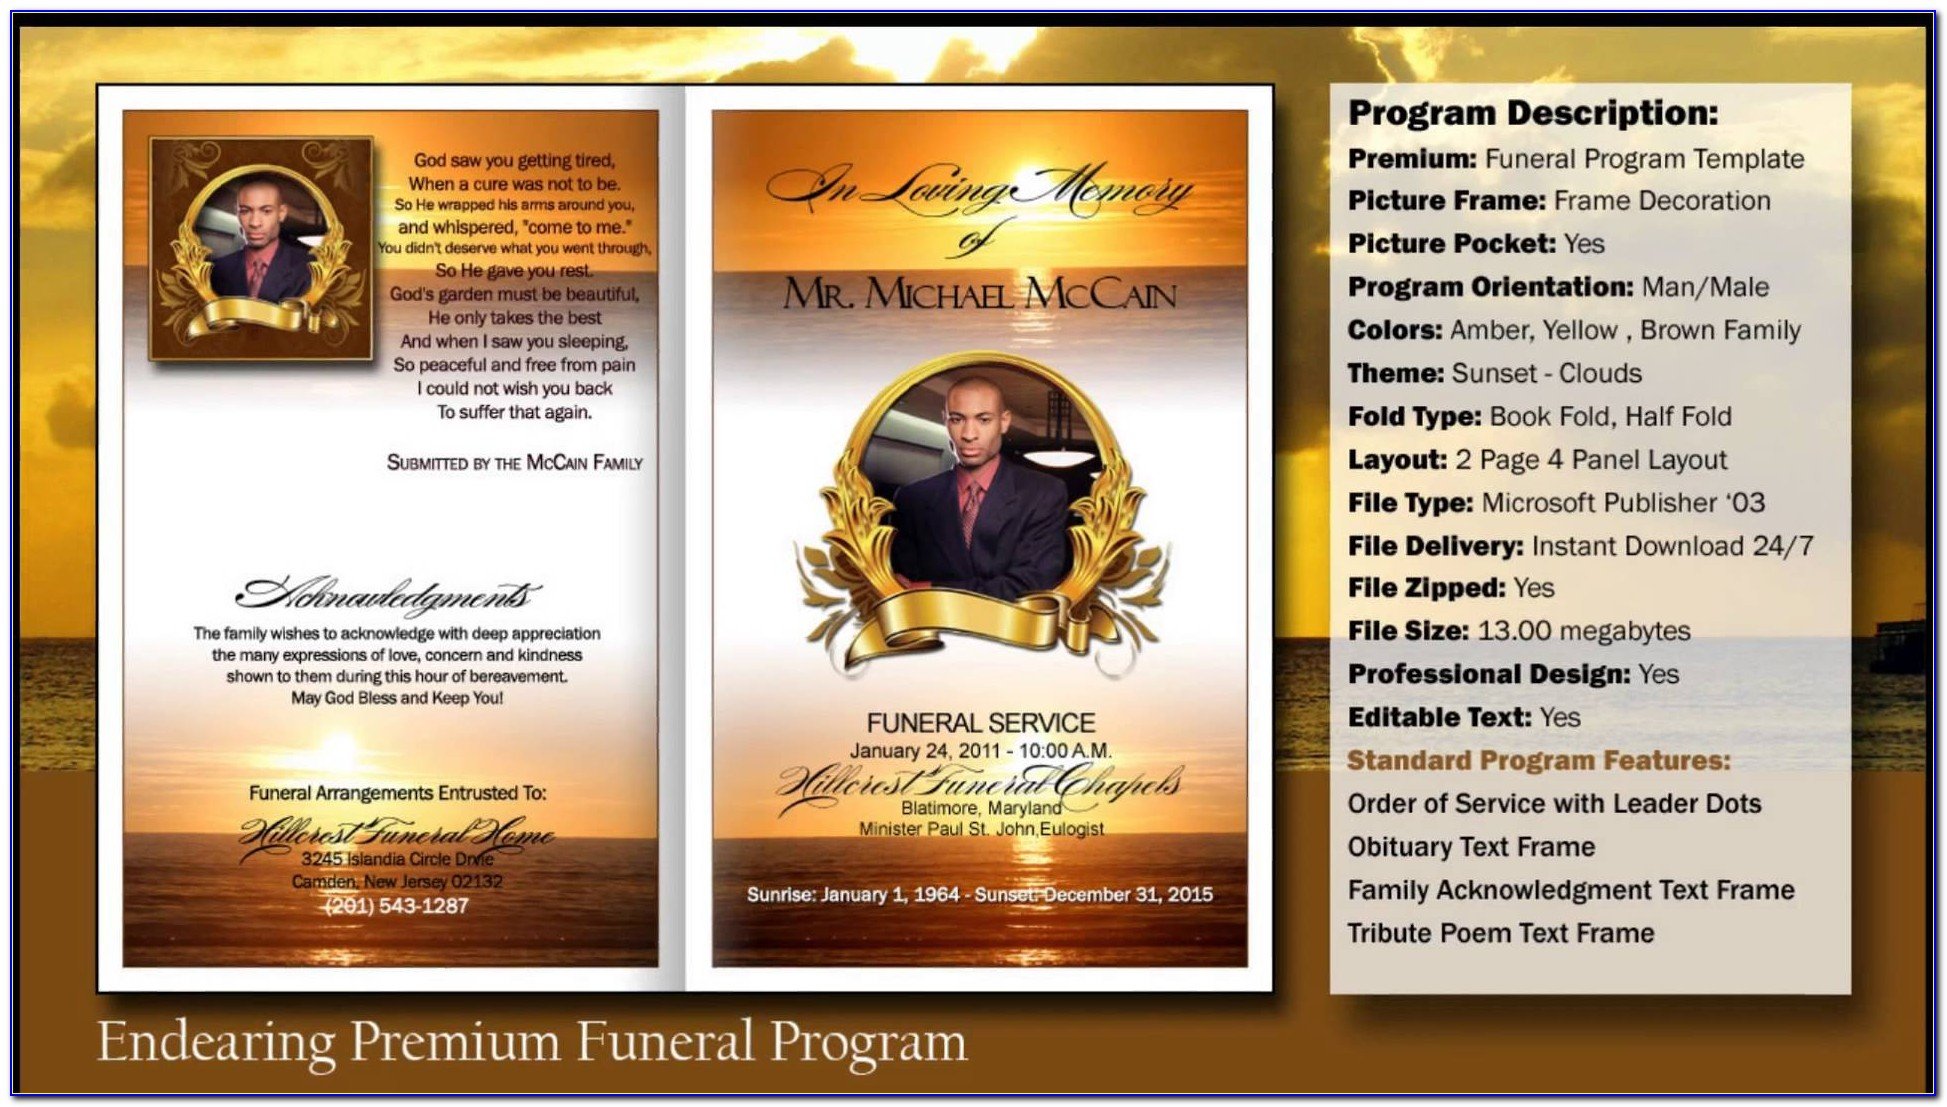 Funeral Program Template Microsoft Publisher